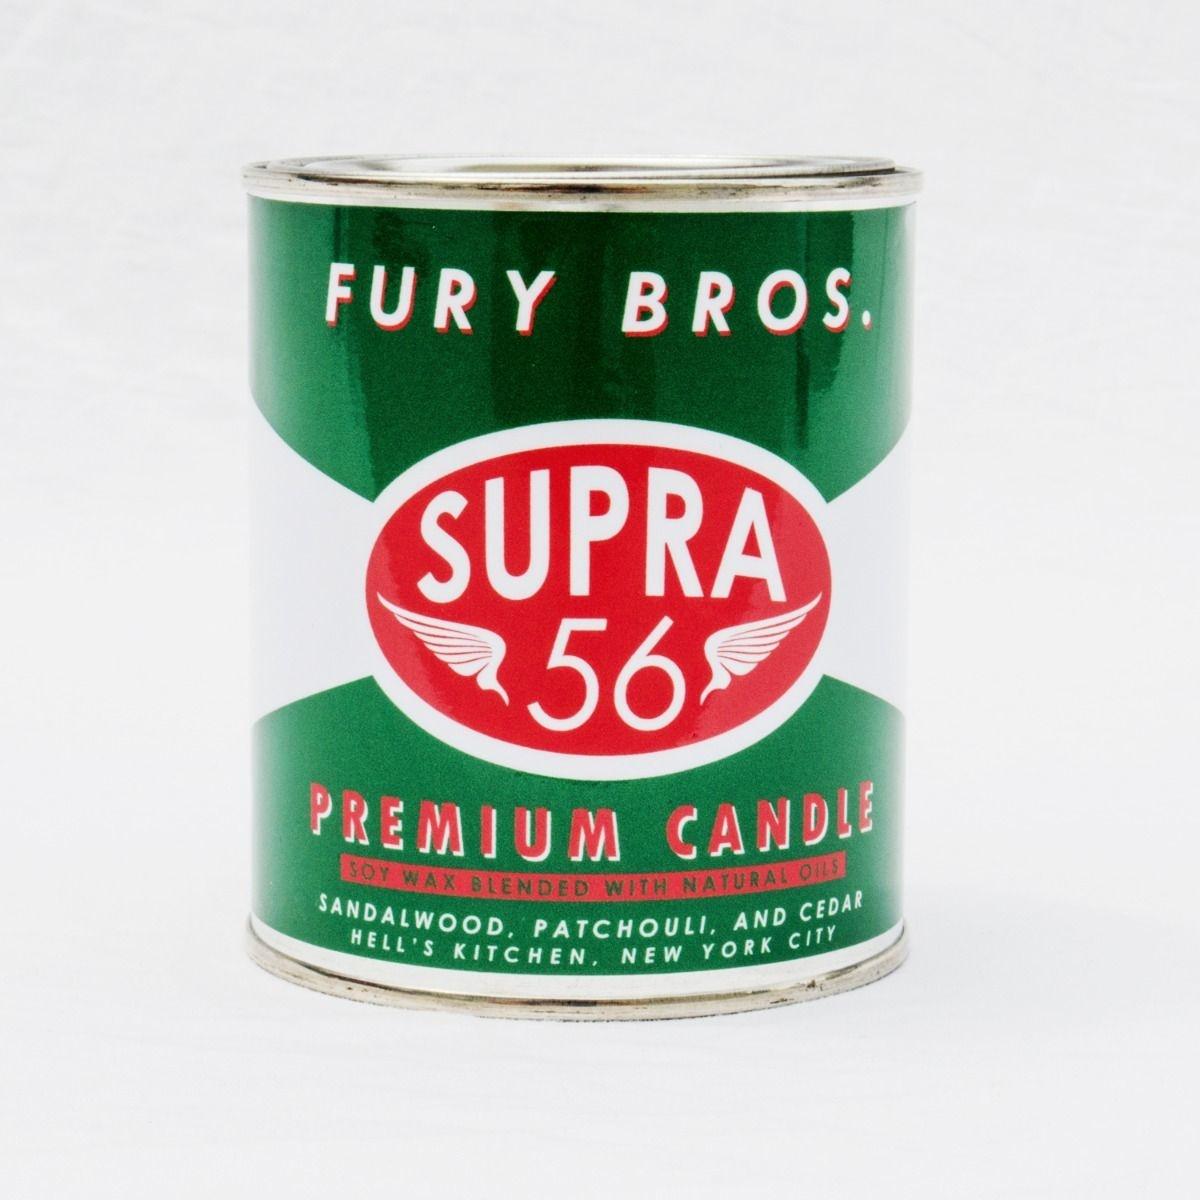 FuryBros Supra 56 Candle 12.5oz